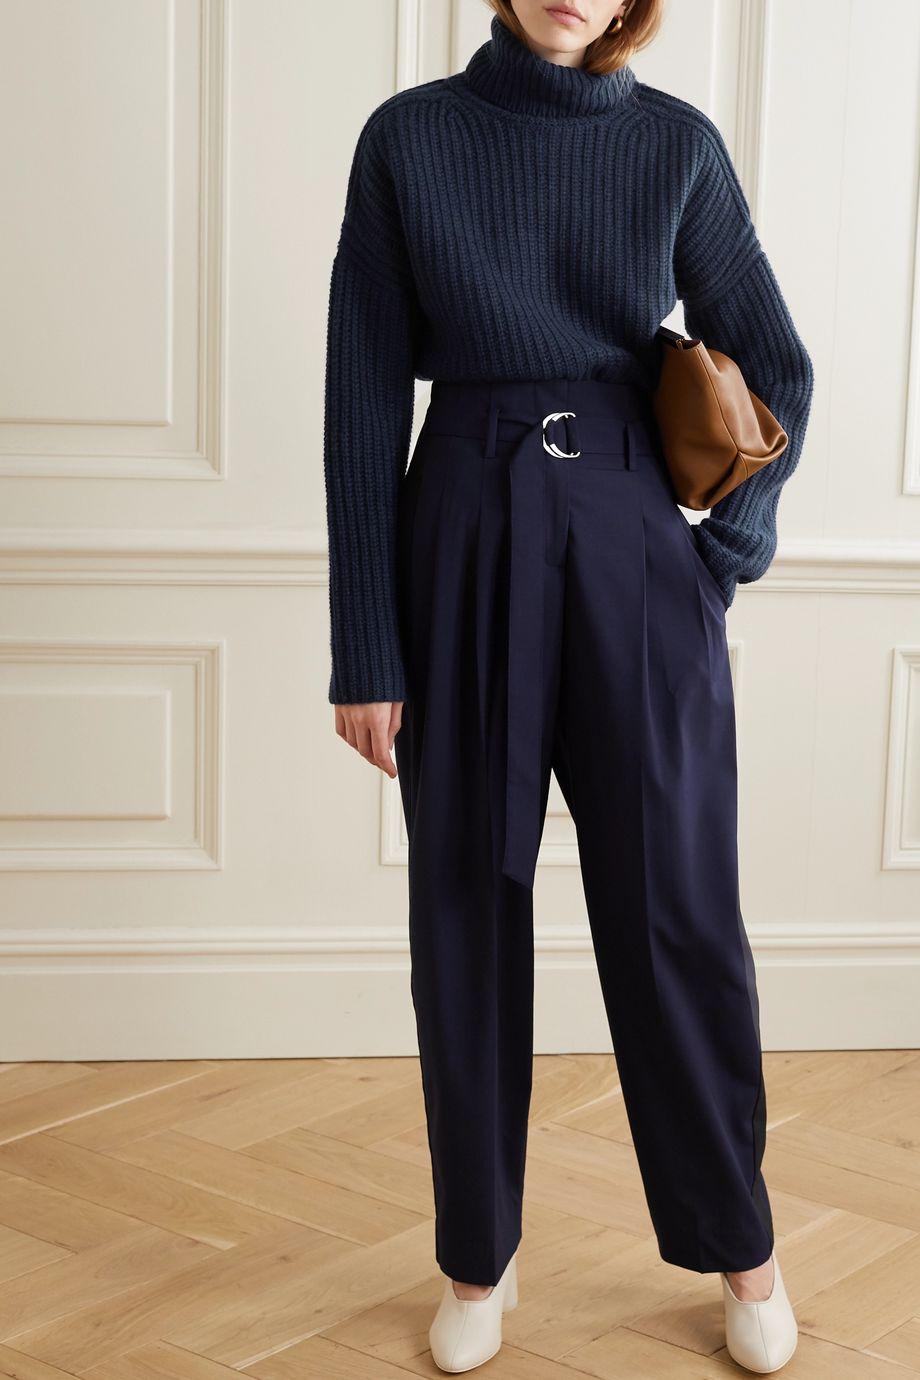 La Ligne Ribbed cashmere turtleneck sweater